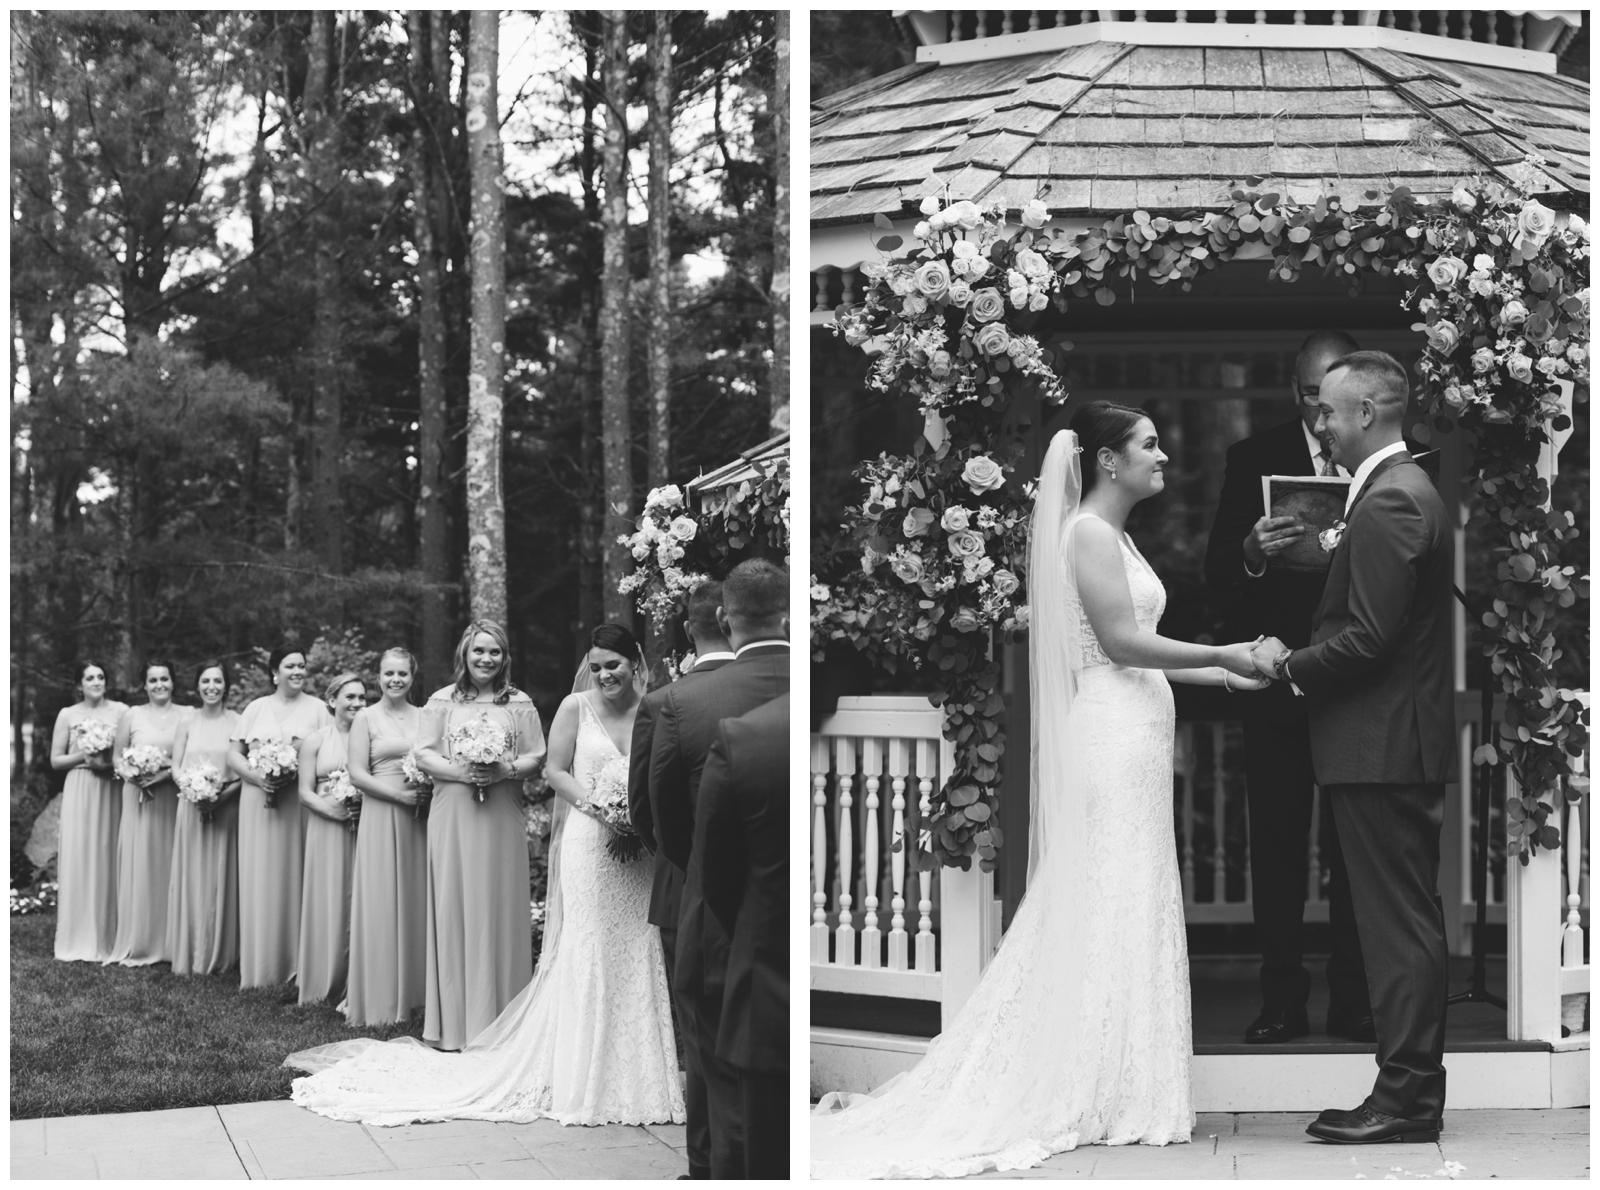 Bailey-Q-Photo-Pine-Hills-Pavilion-Wedding-Boston-Wedding-Photographer-065.jpg